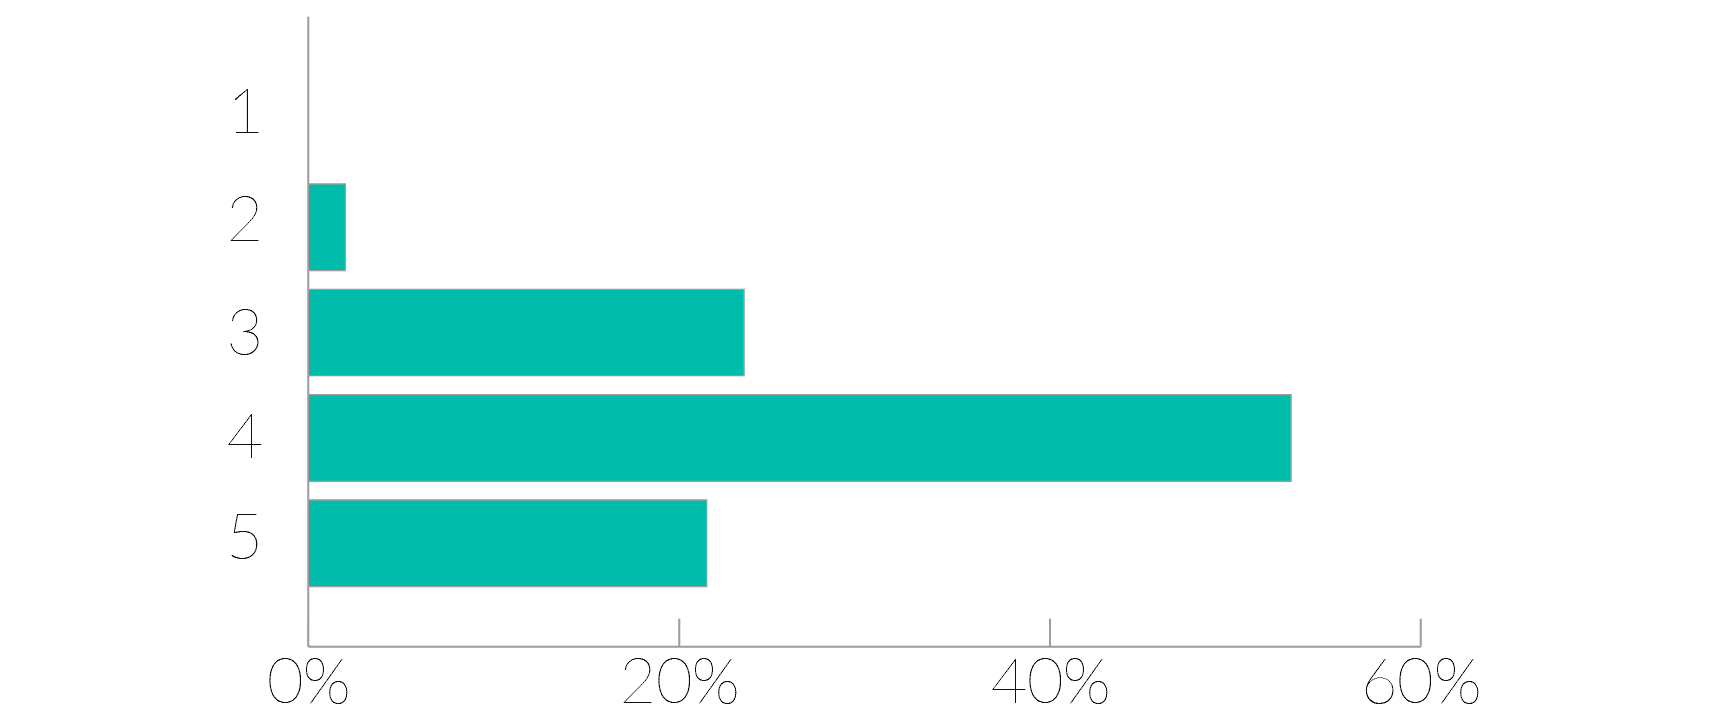 Morningscore star rating bar graph